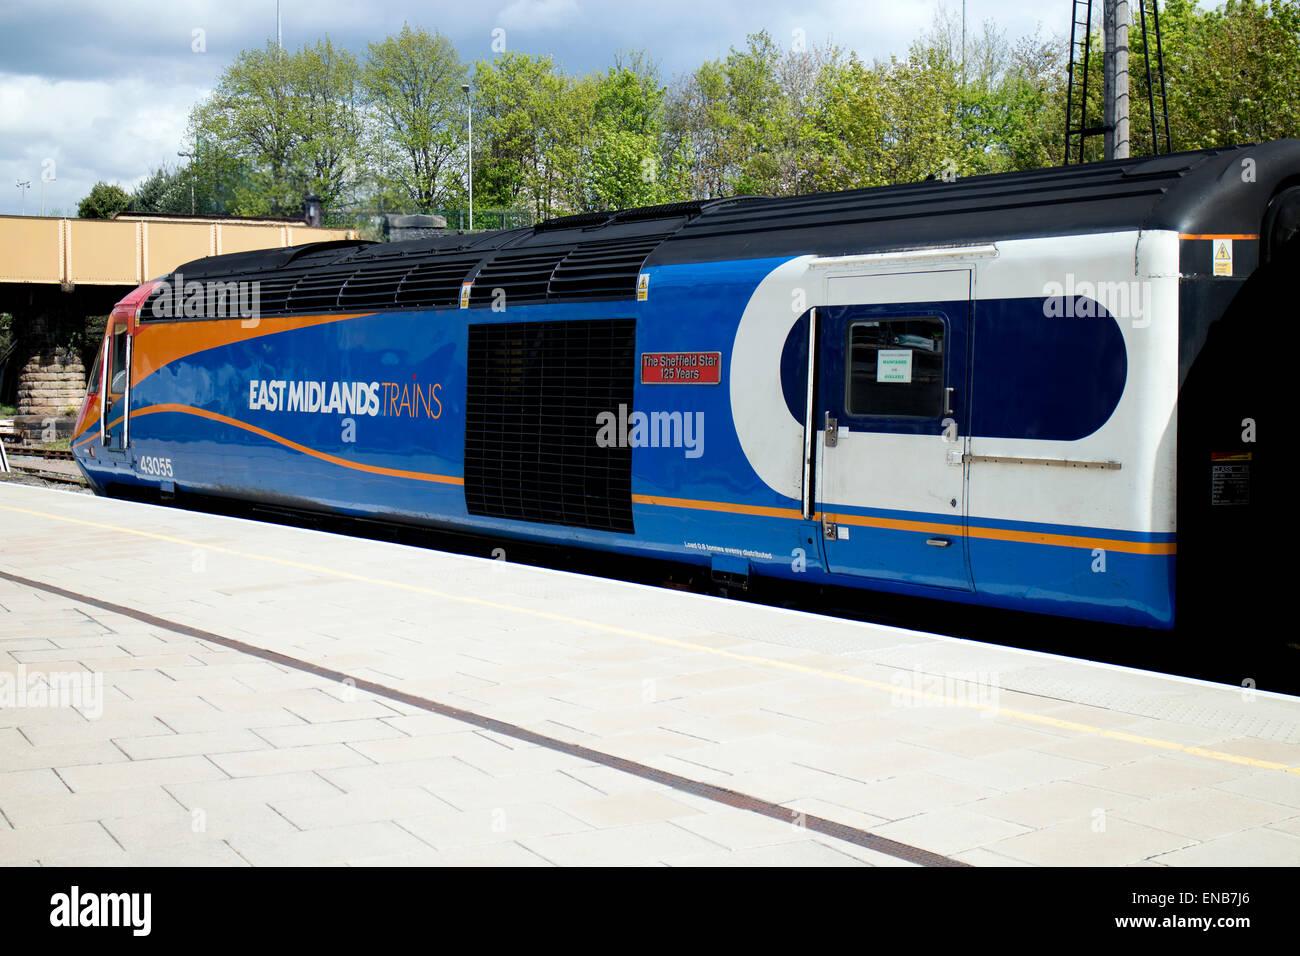 East Midlands Trains HST service at Leicester station, UK - Stock Image